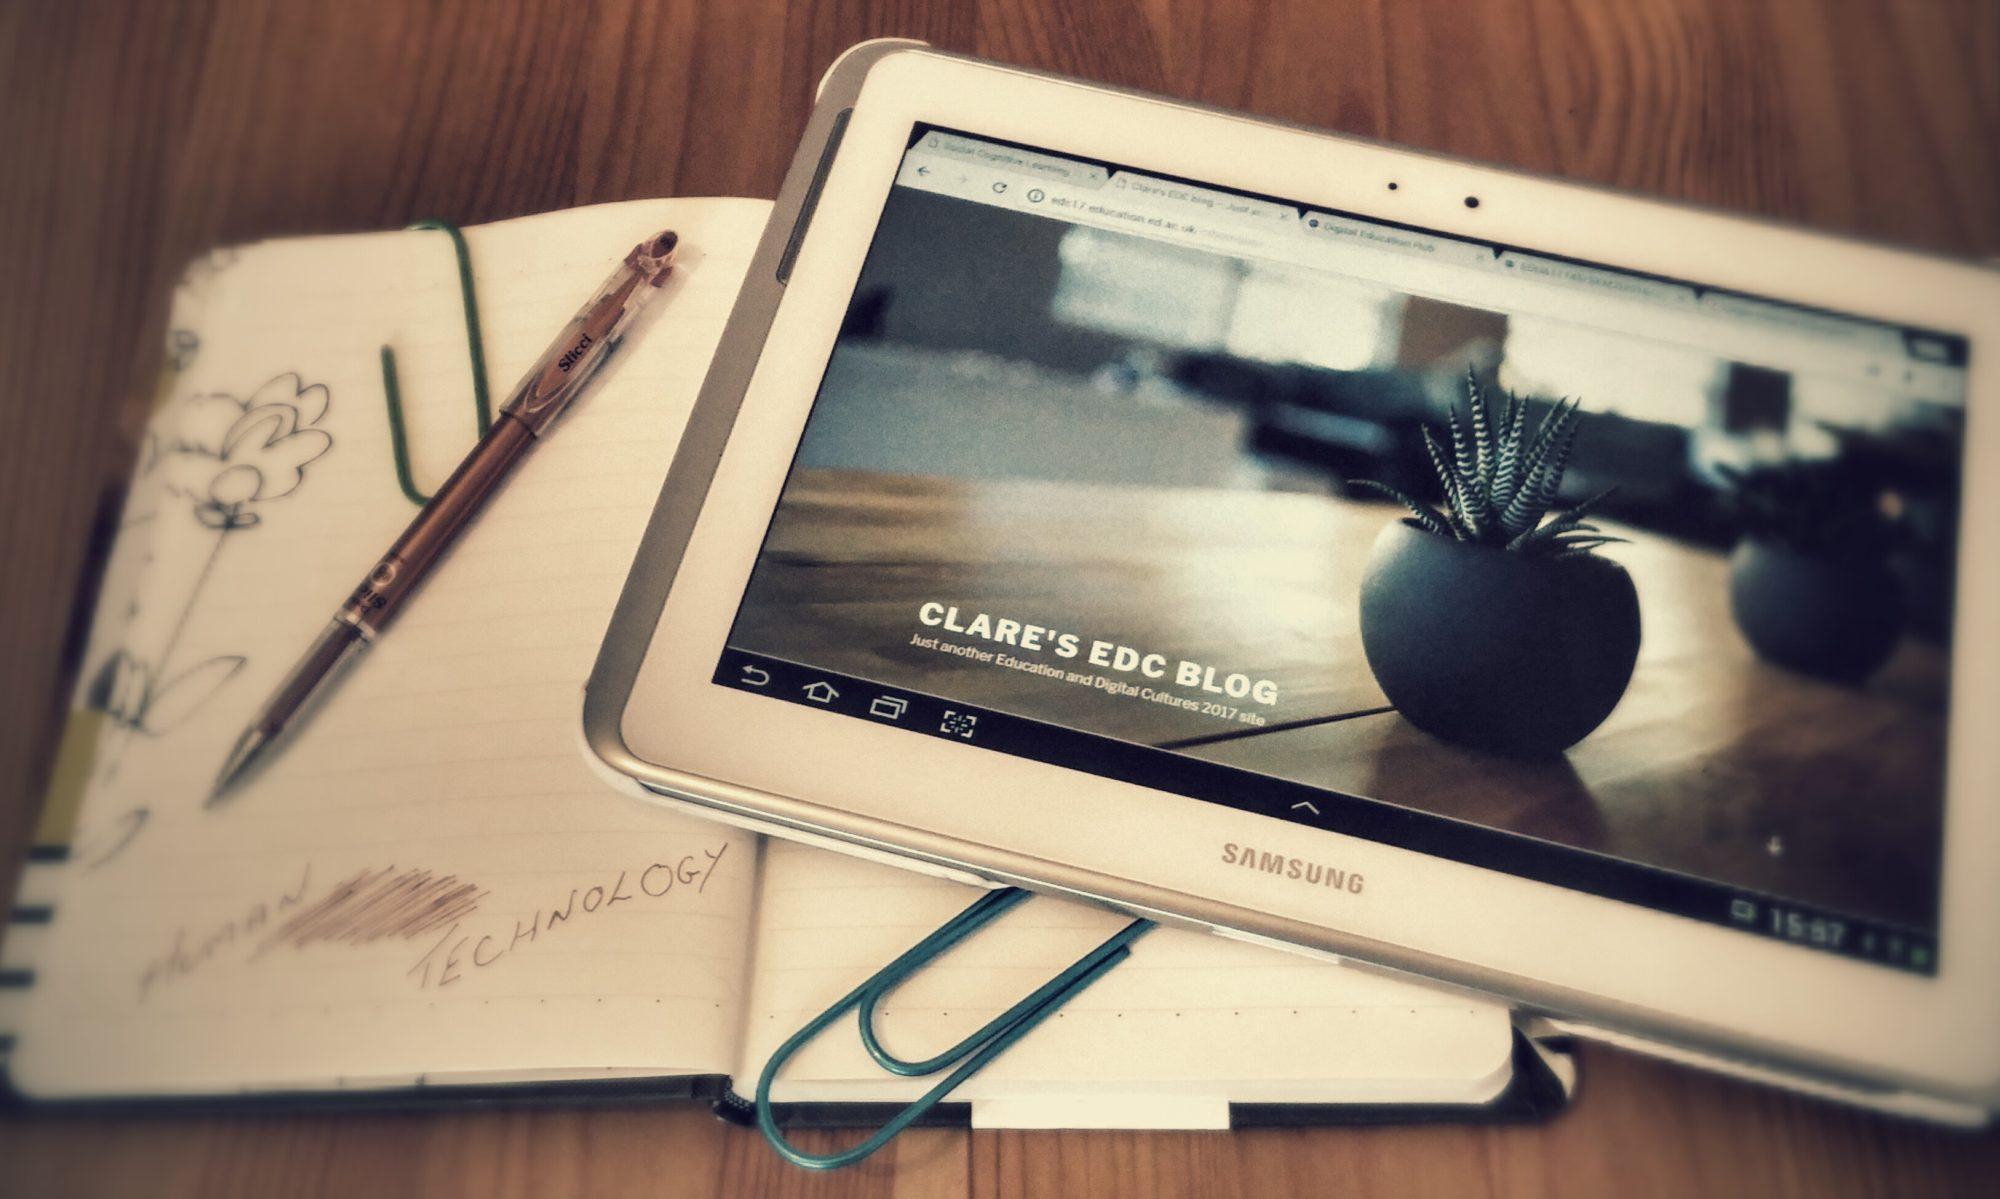 Clare's EDC blog